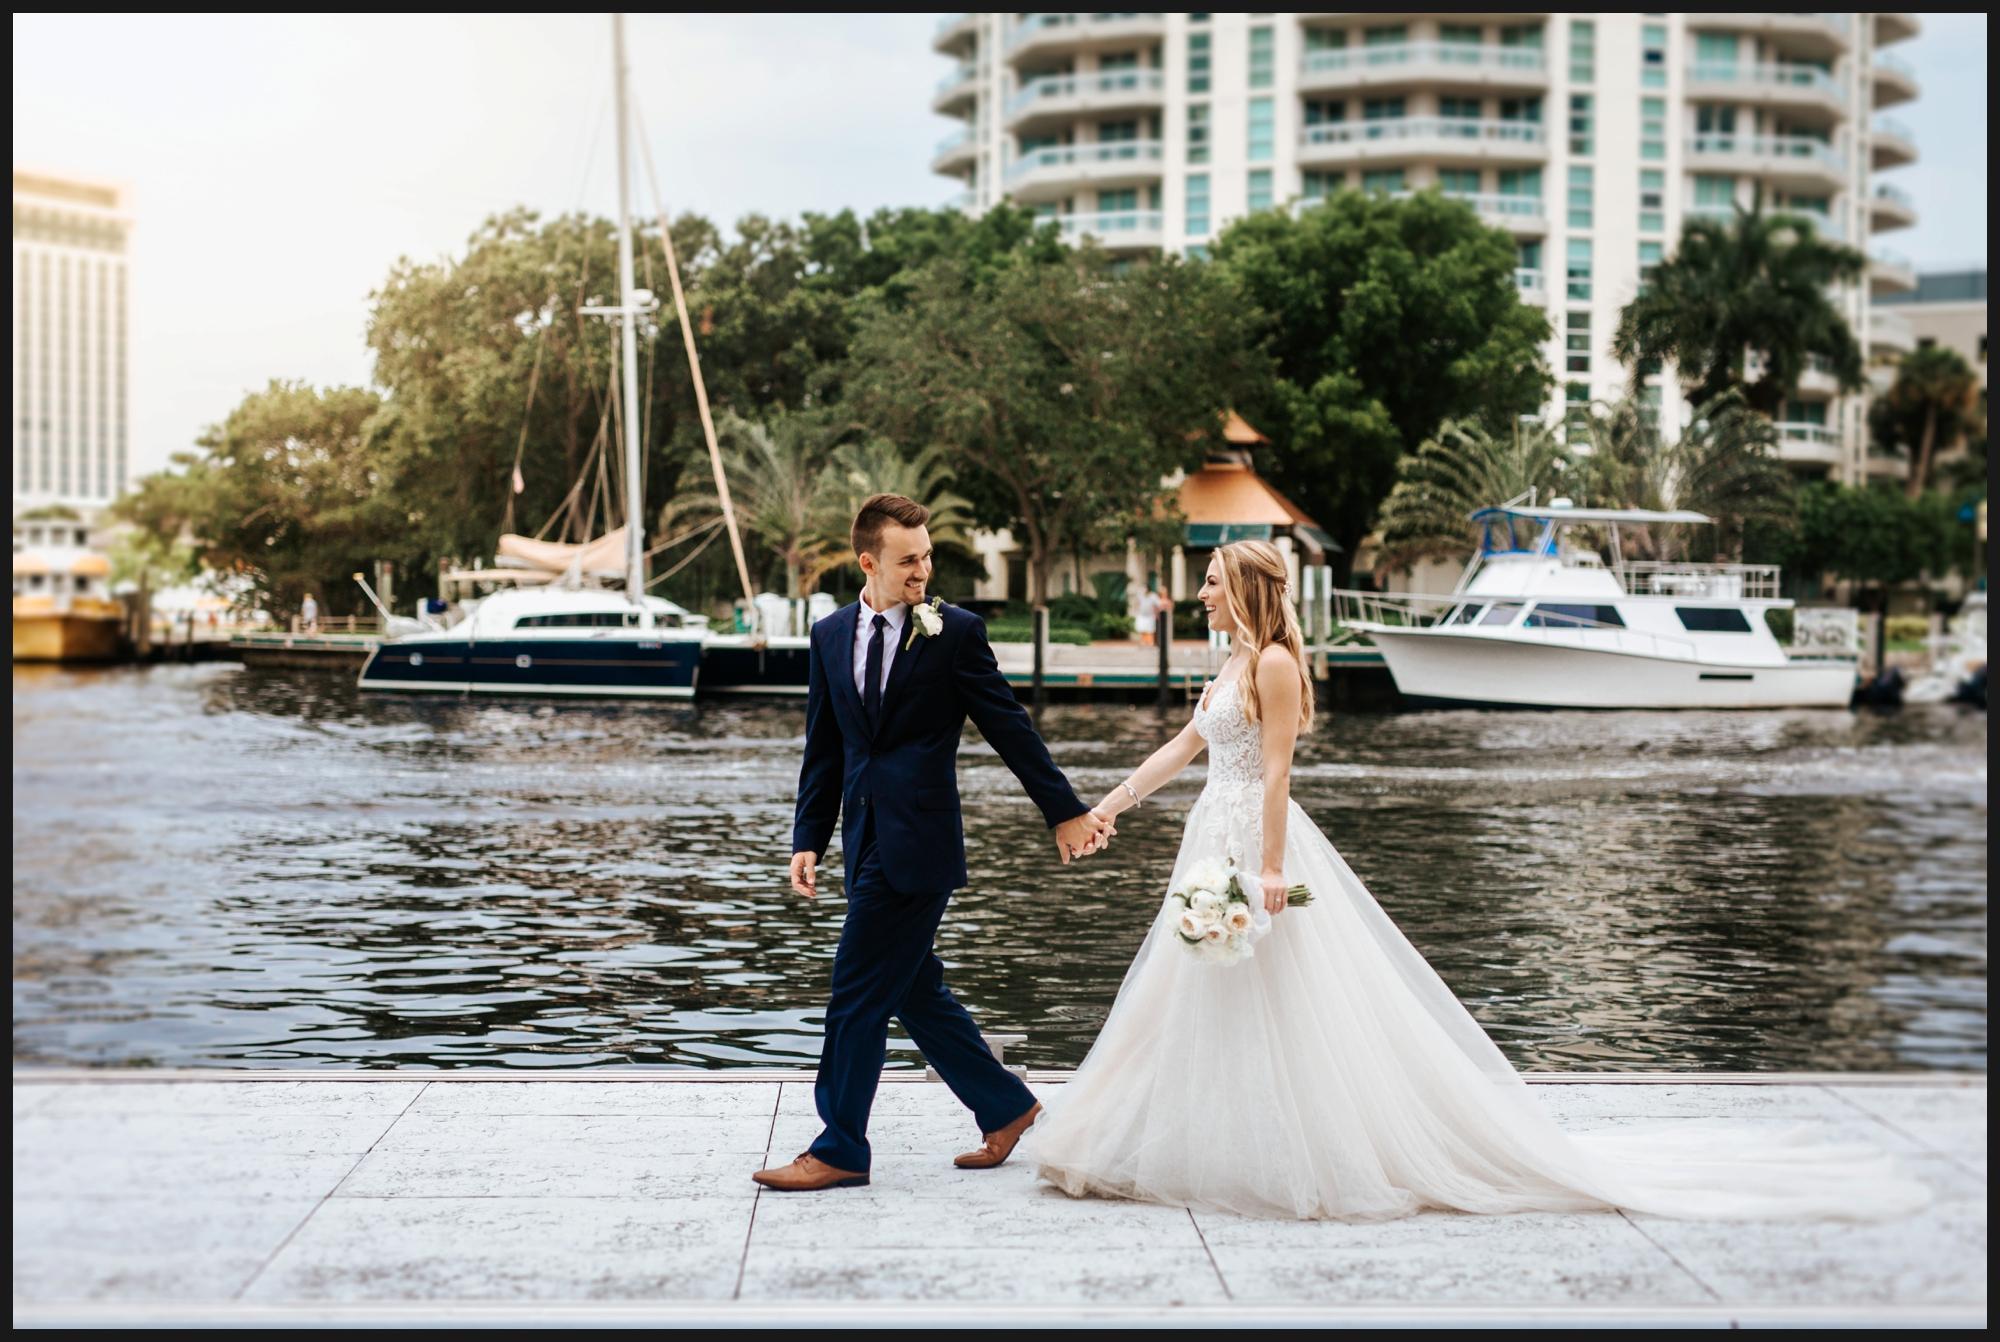 Orlando-Wedding-Photographer-destination-wedding-photographer-florida-wedding-photographer-bohemian-wedding-photographer_0095.jpg